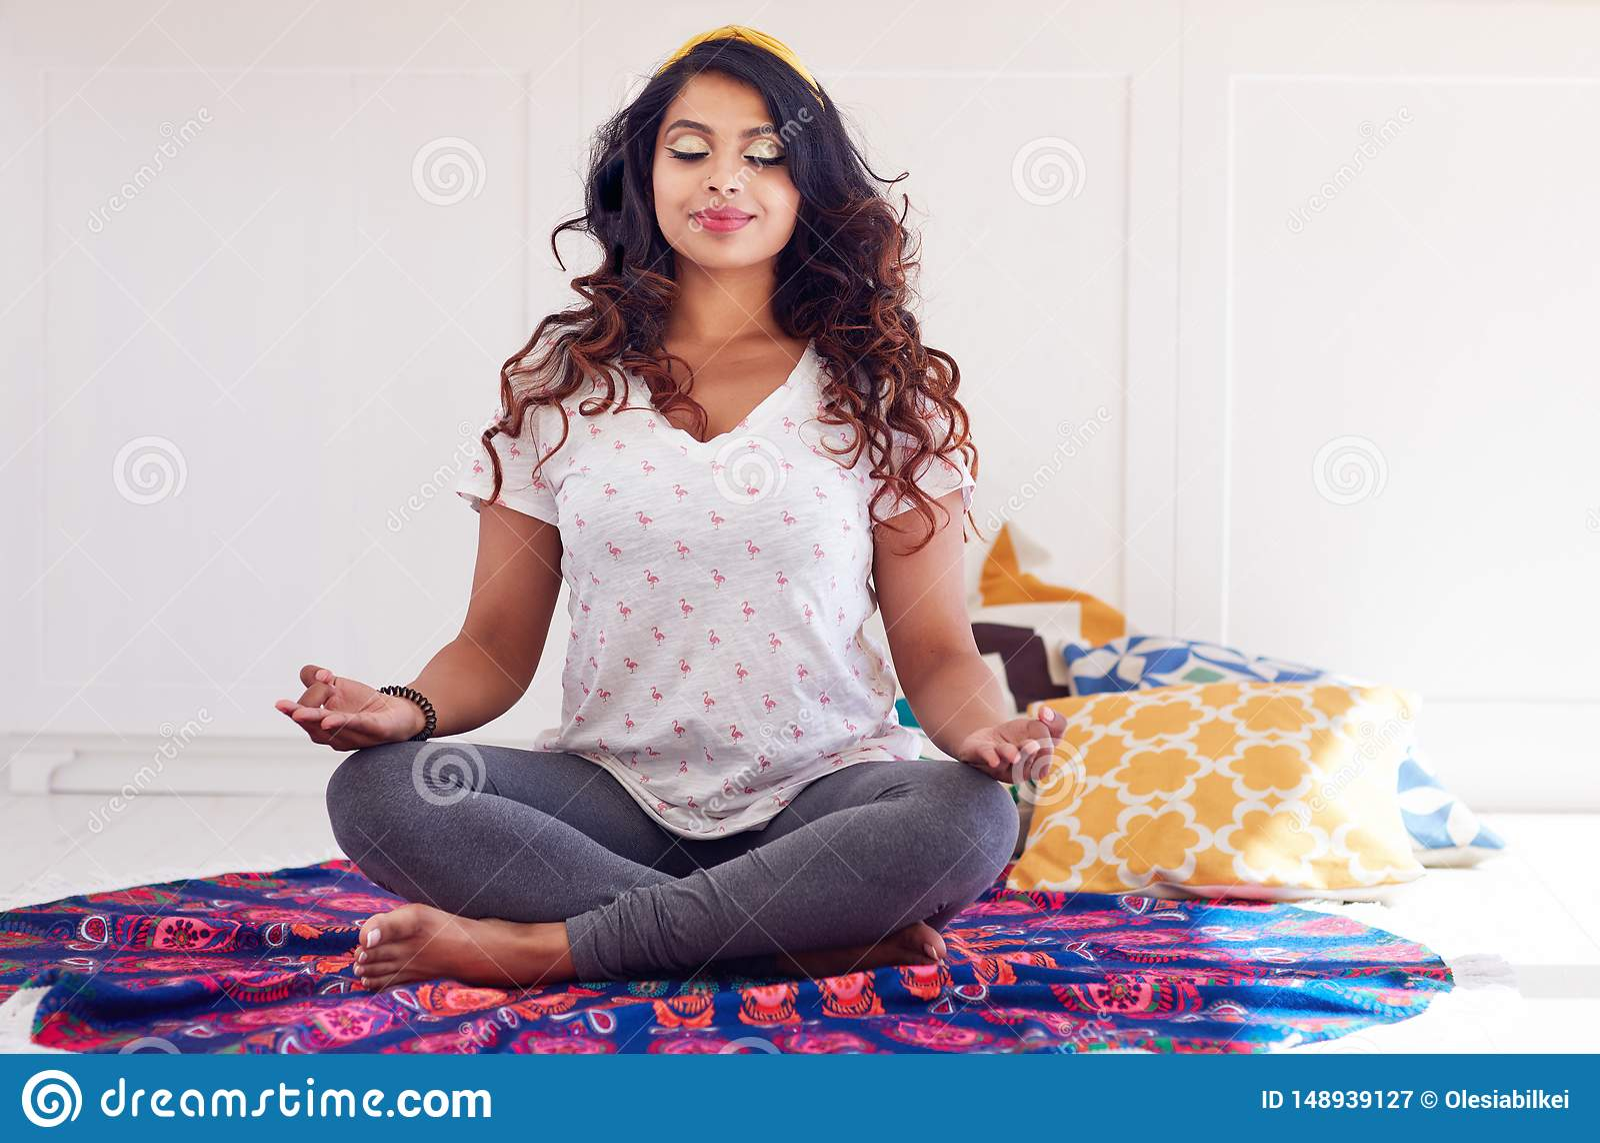 Beautiful Indian Woman Doing Yoga Exercises At Home Padmasana Or Lotus Pose Stock Image Image Of Meditate Hand 148939127